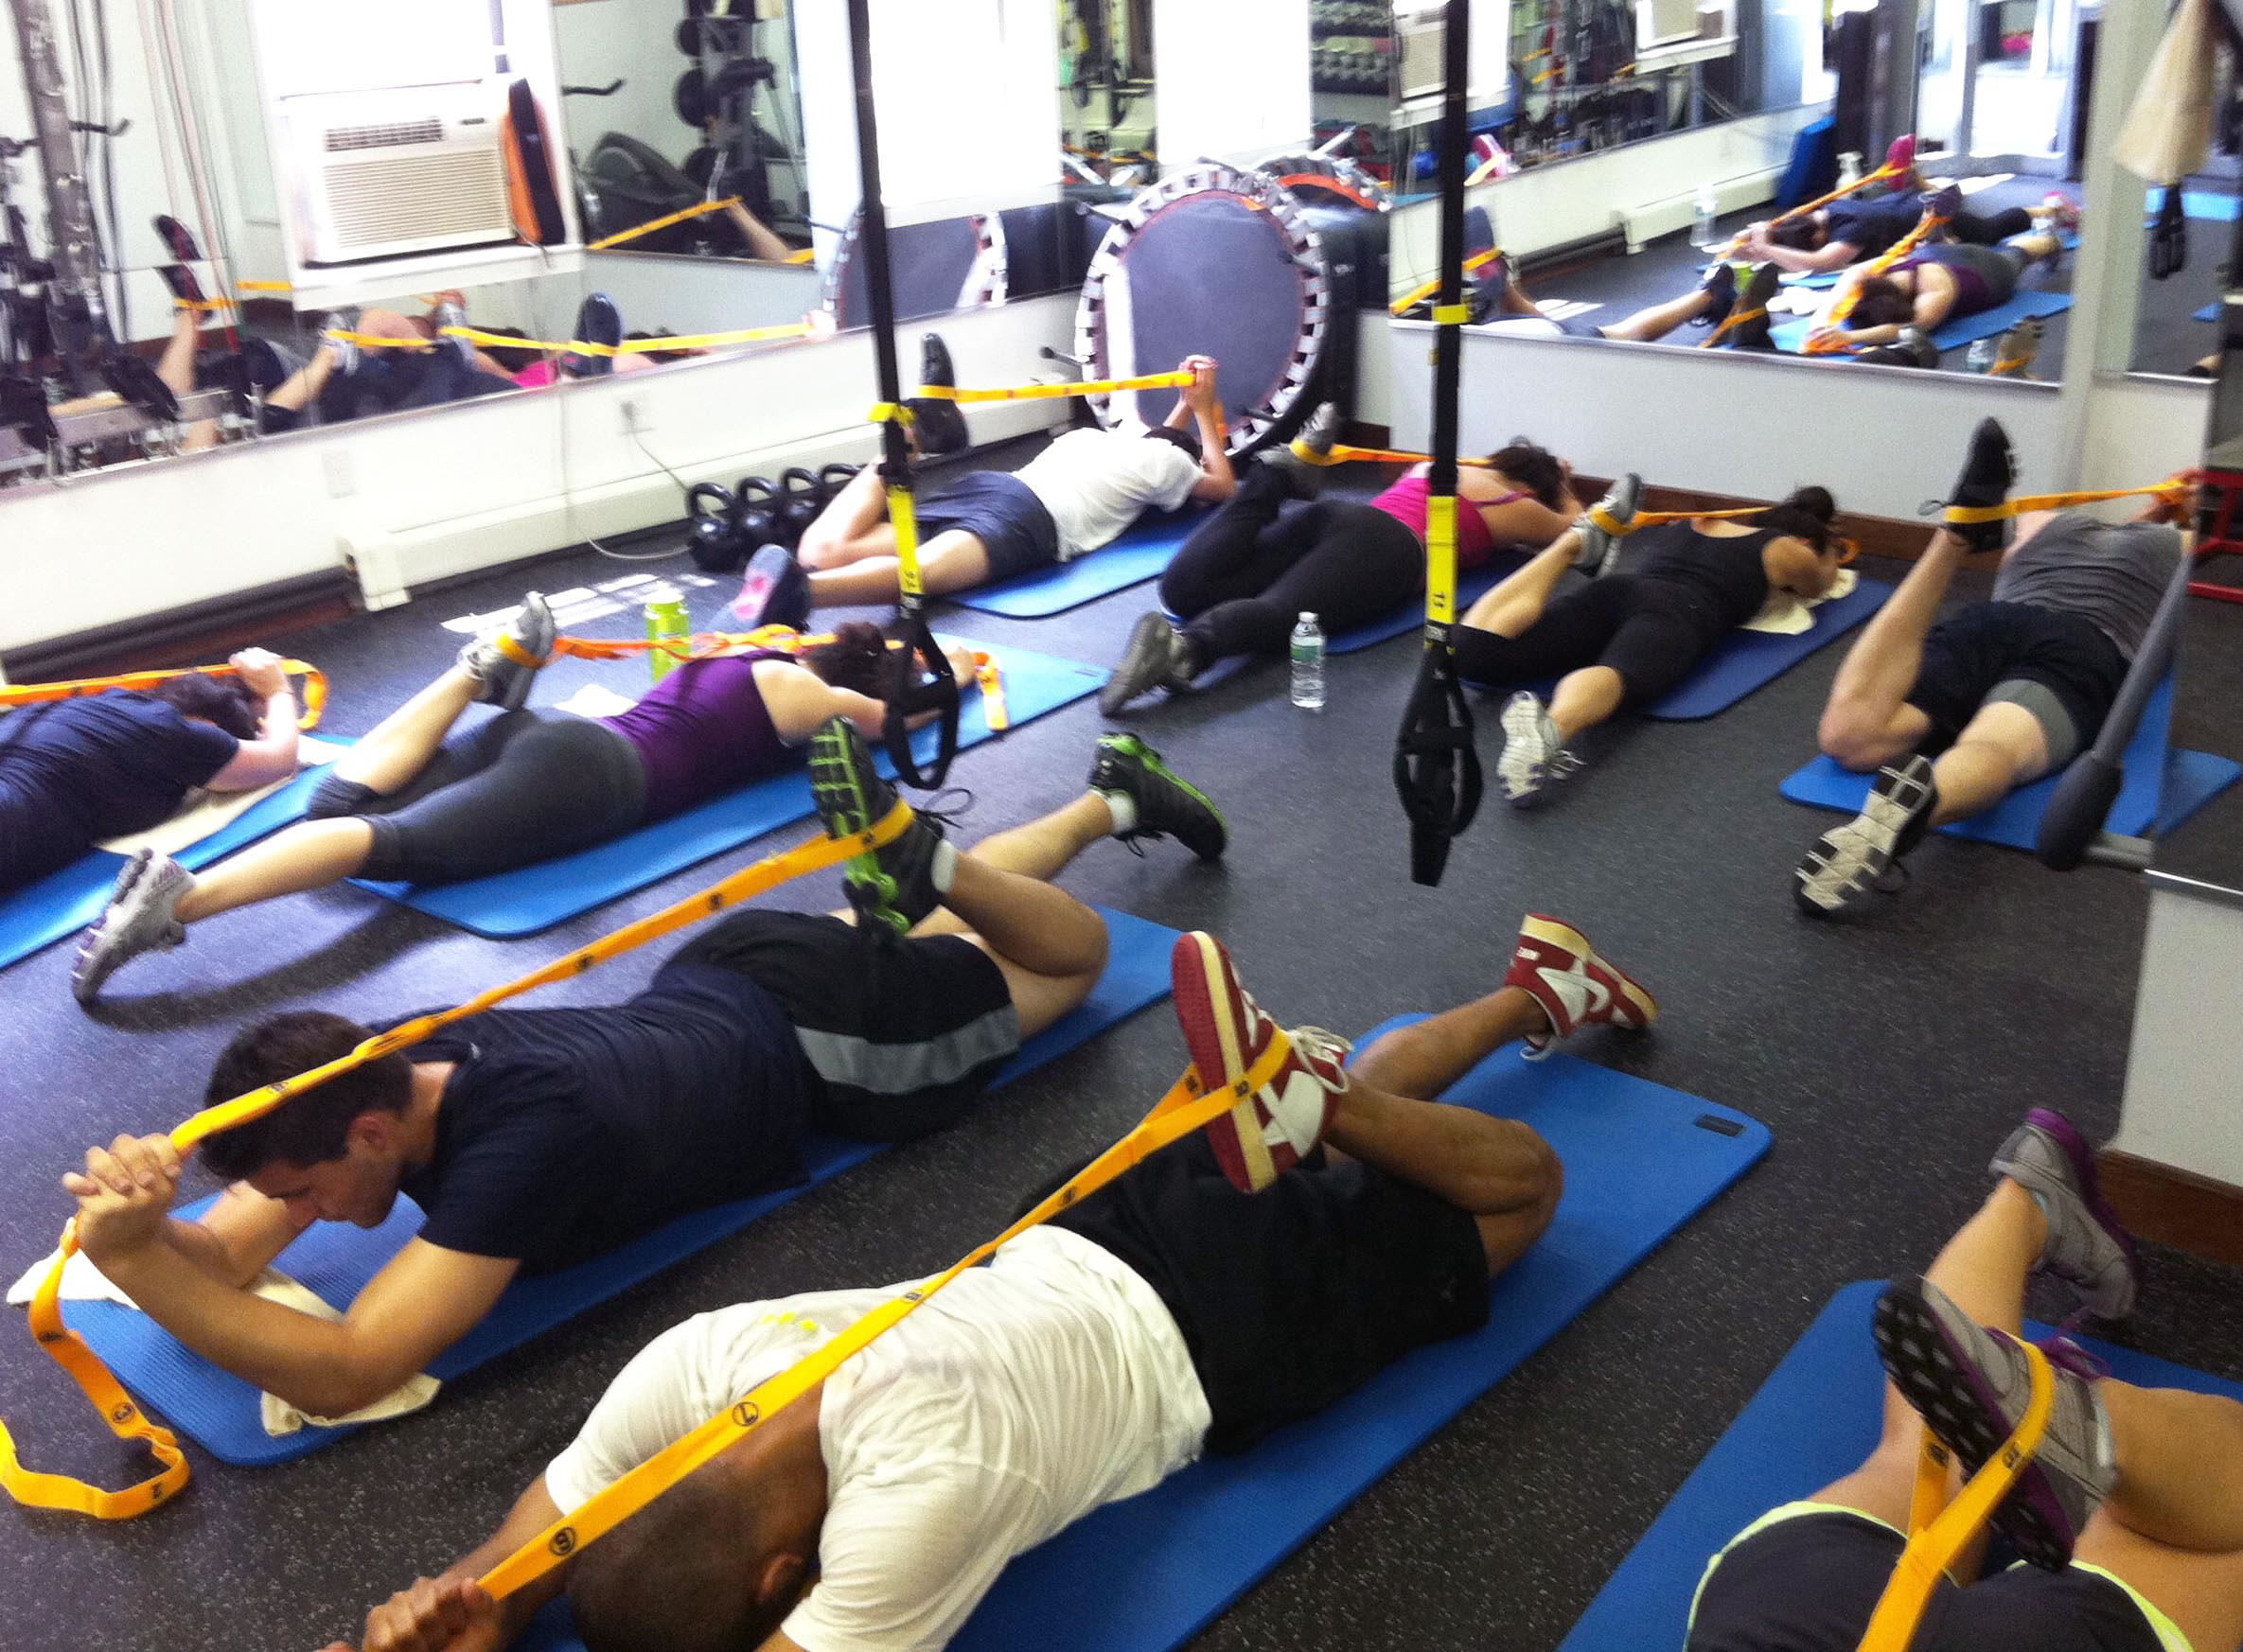 TS Fitness